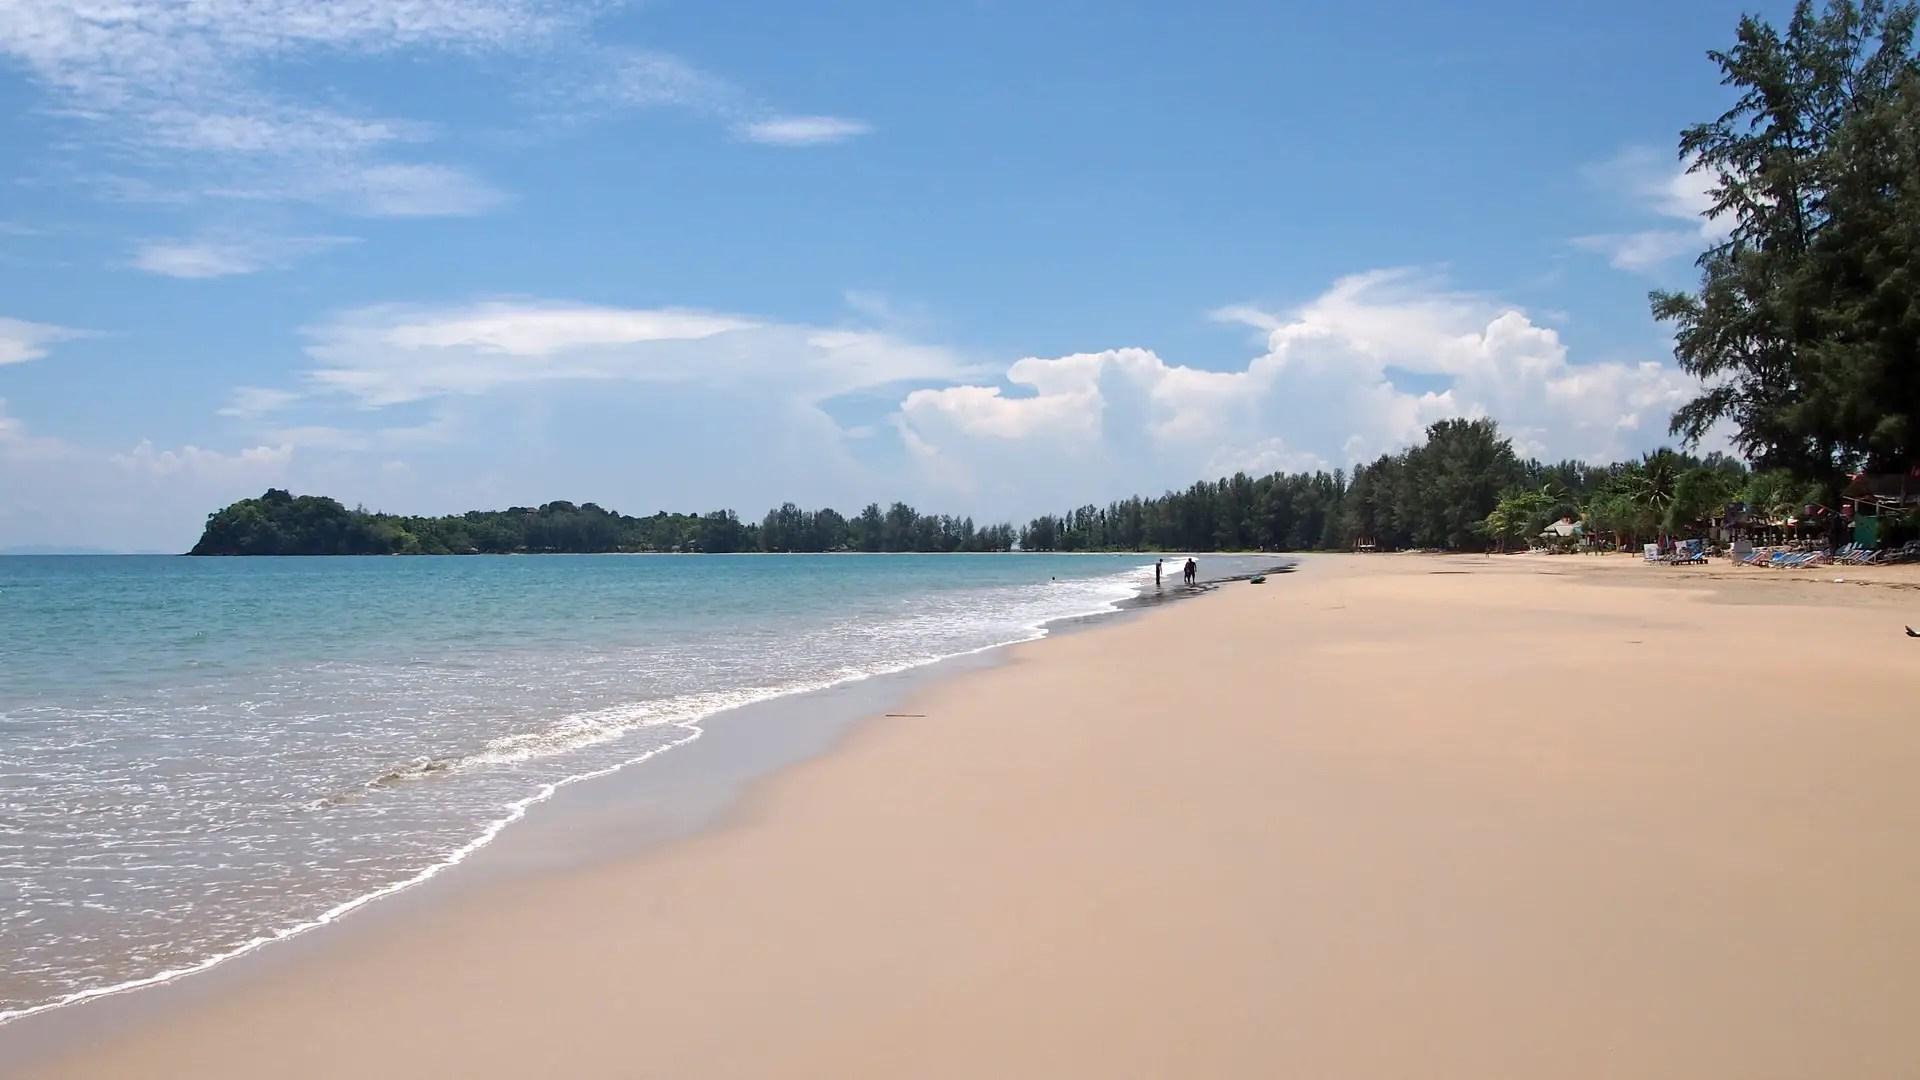 Sun Wallpaper Hd Koh Lanta Beach Guide The 6 Most Beautiful Beaches